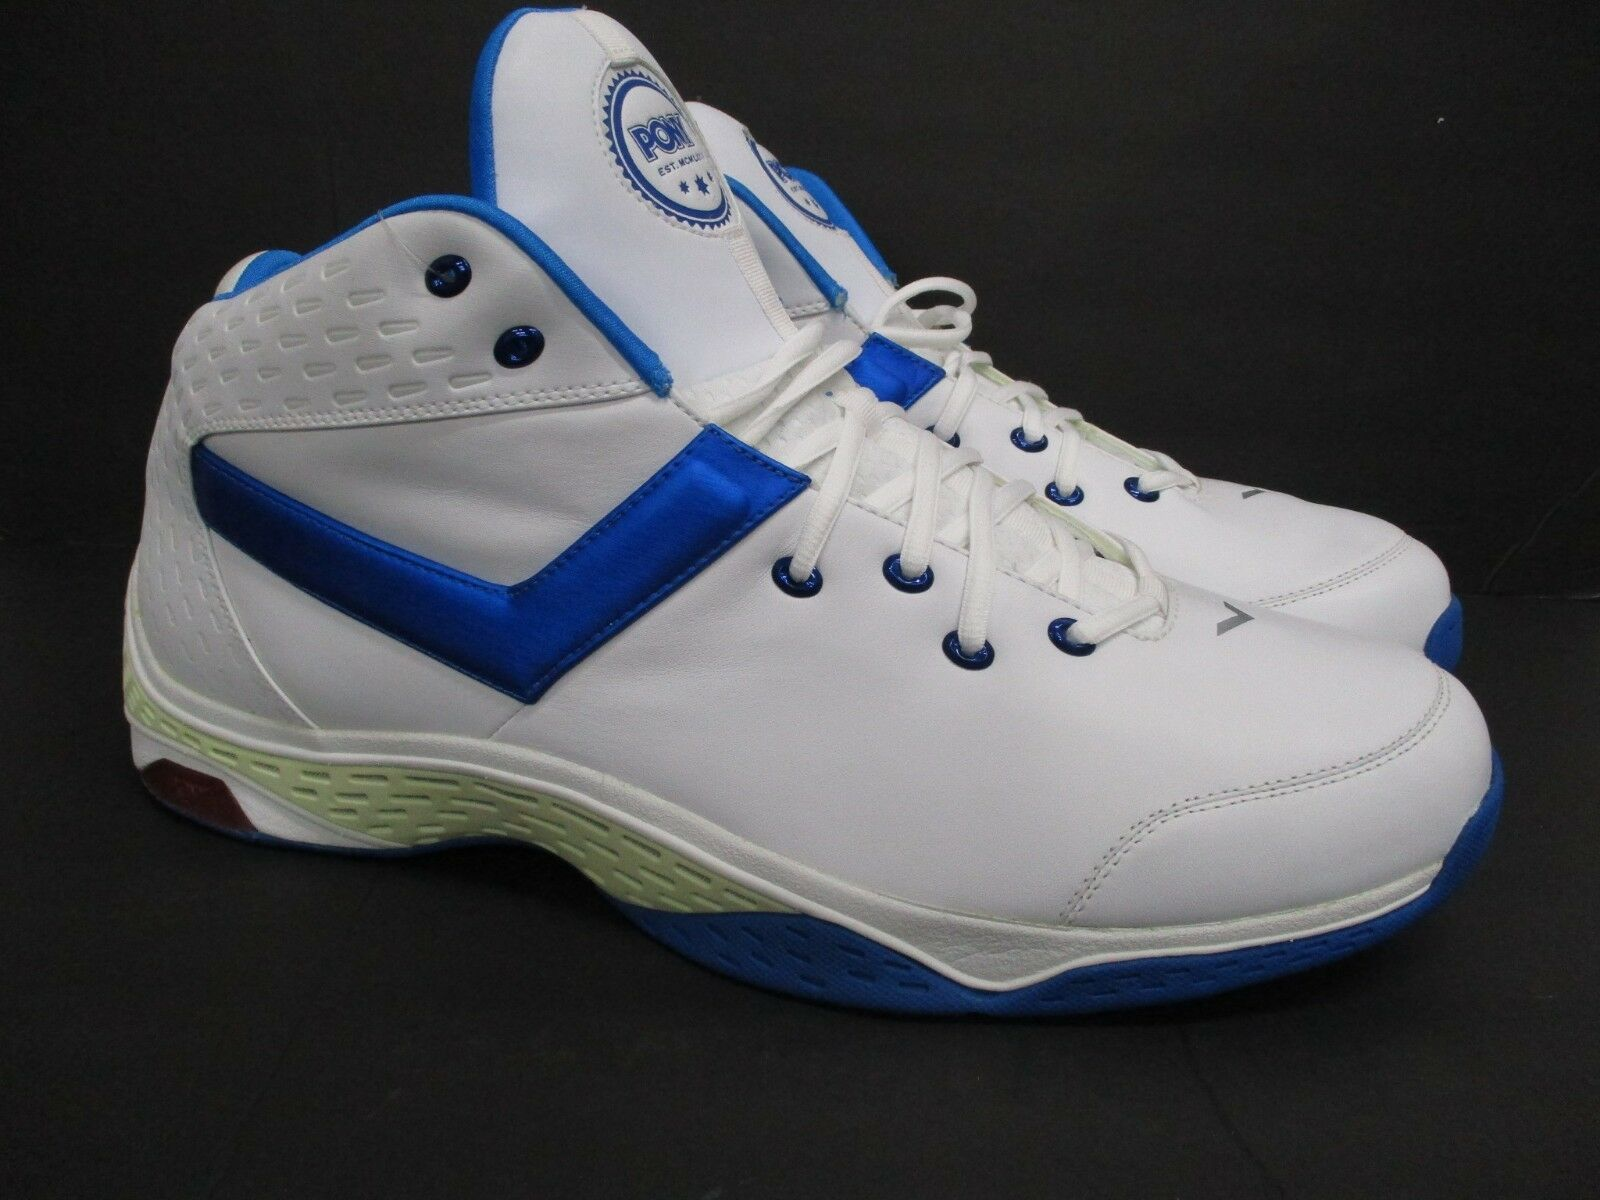 New in Box  Pony Men's EKG High Top White Royal bluee Size  17